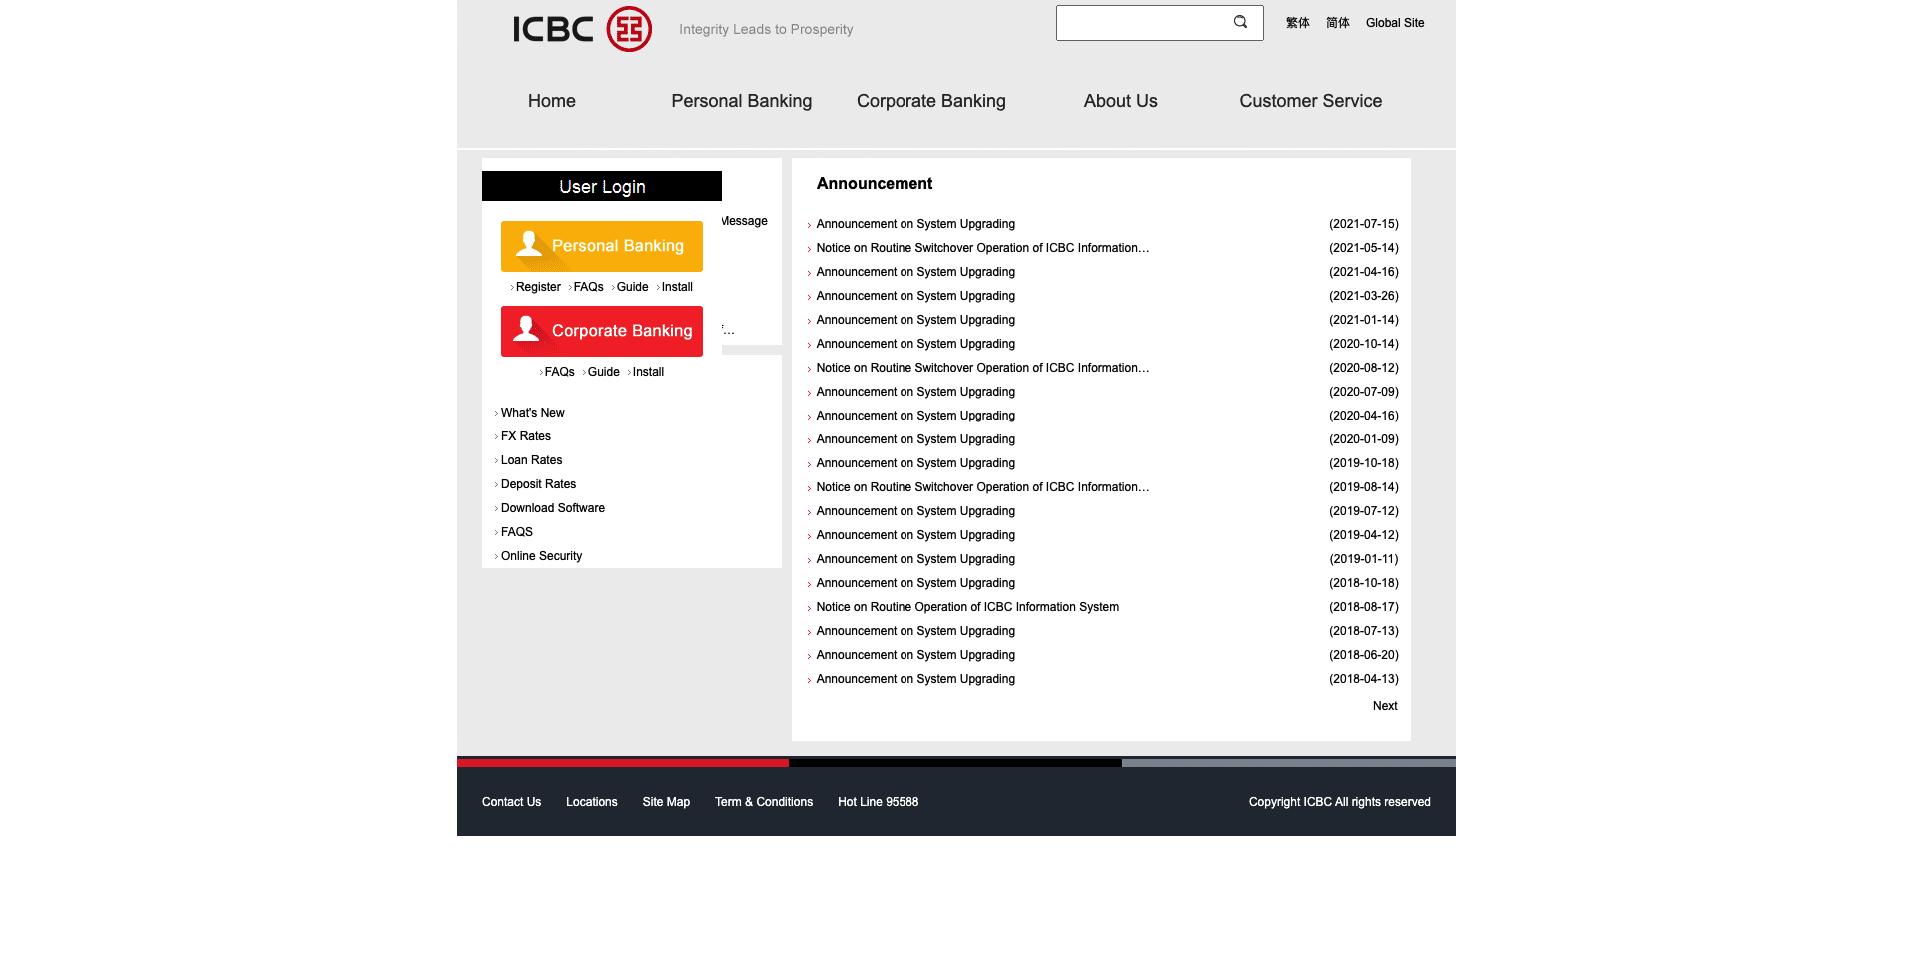 ICBC News